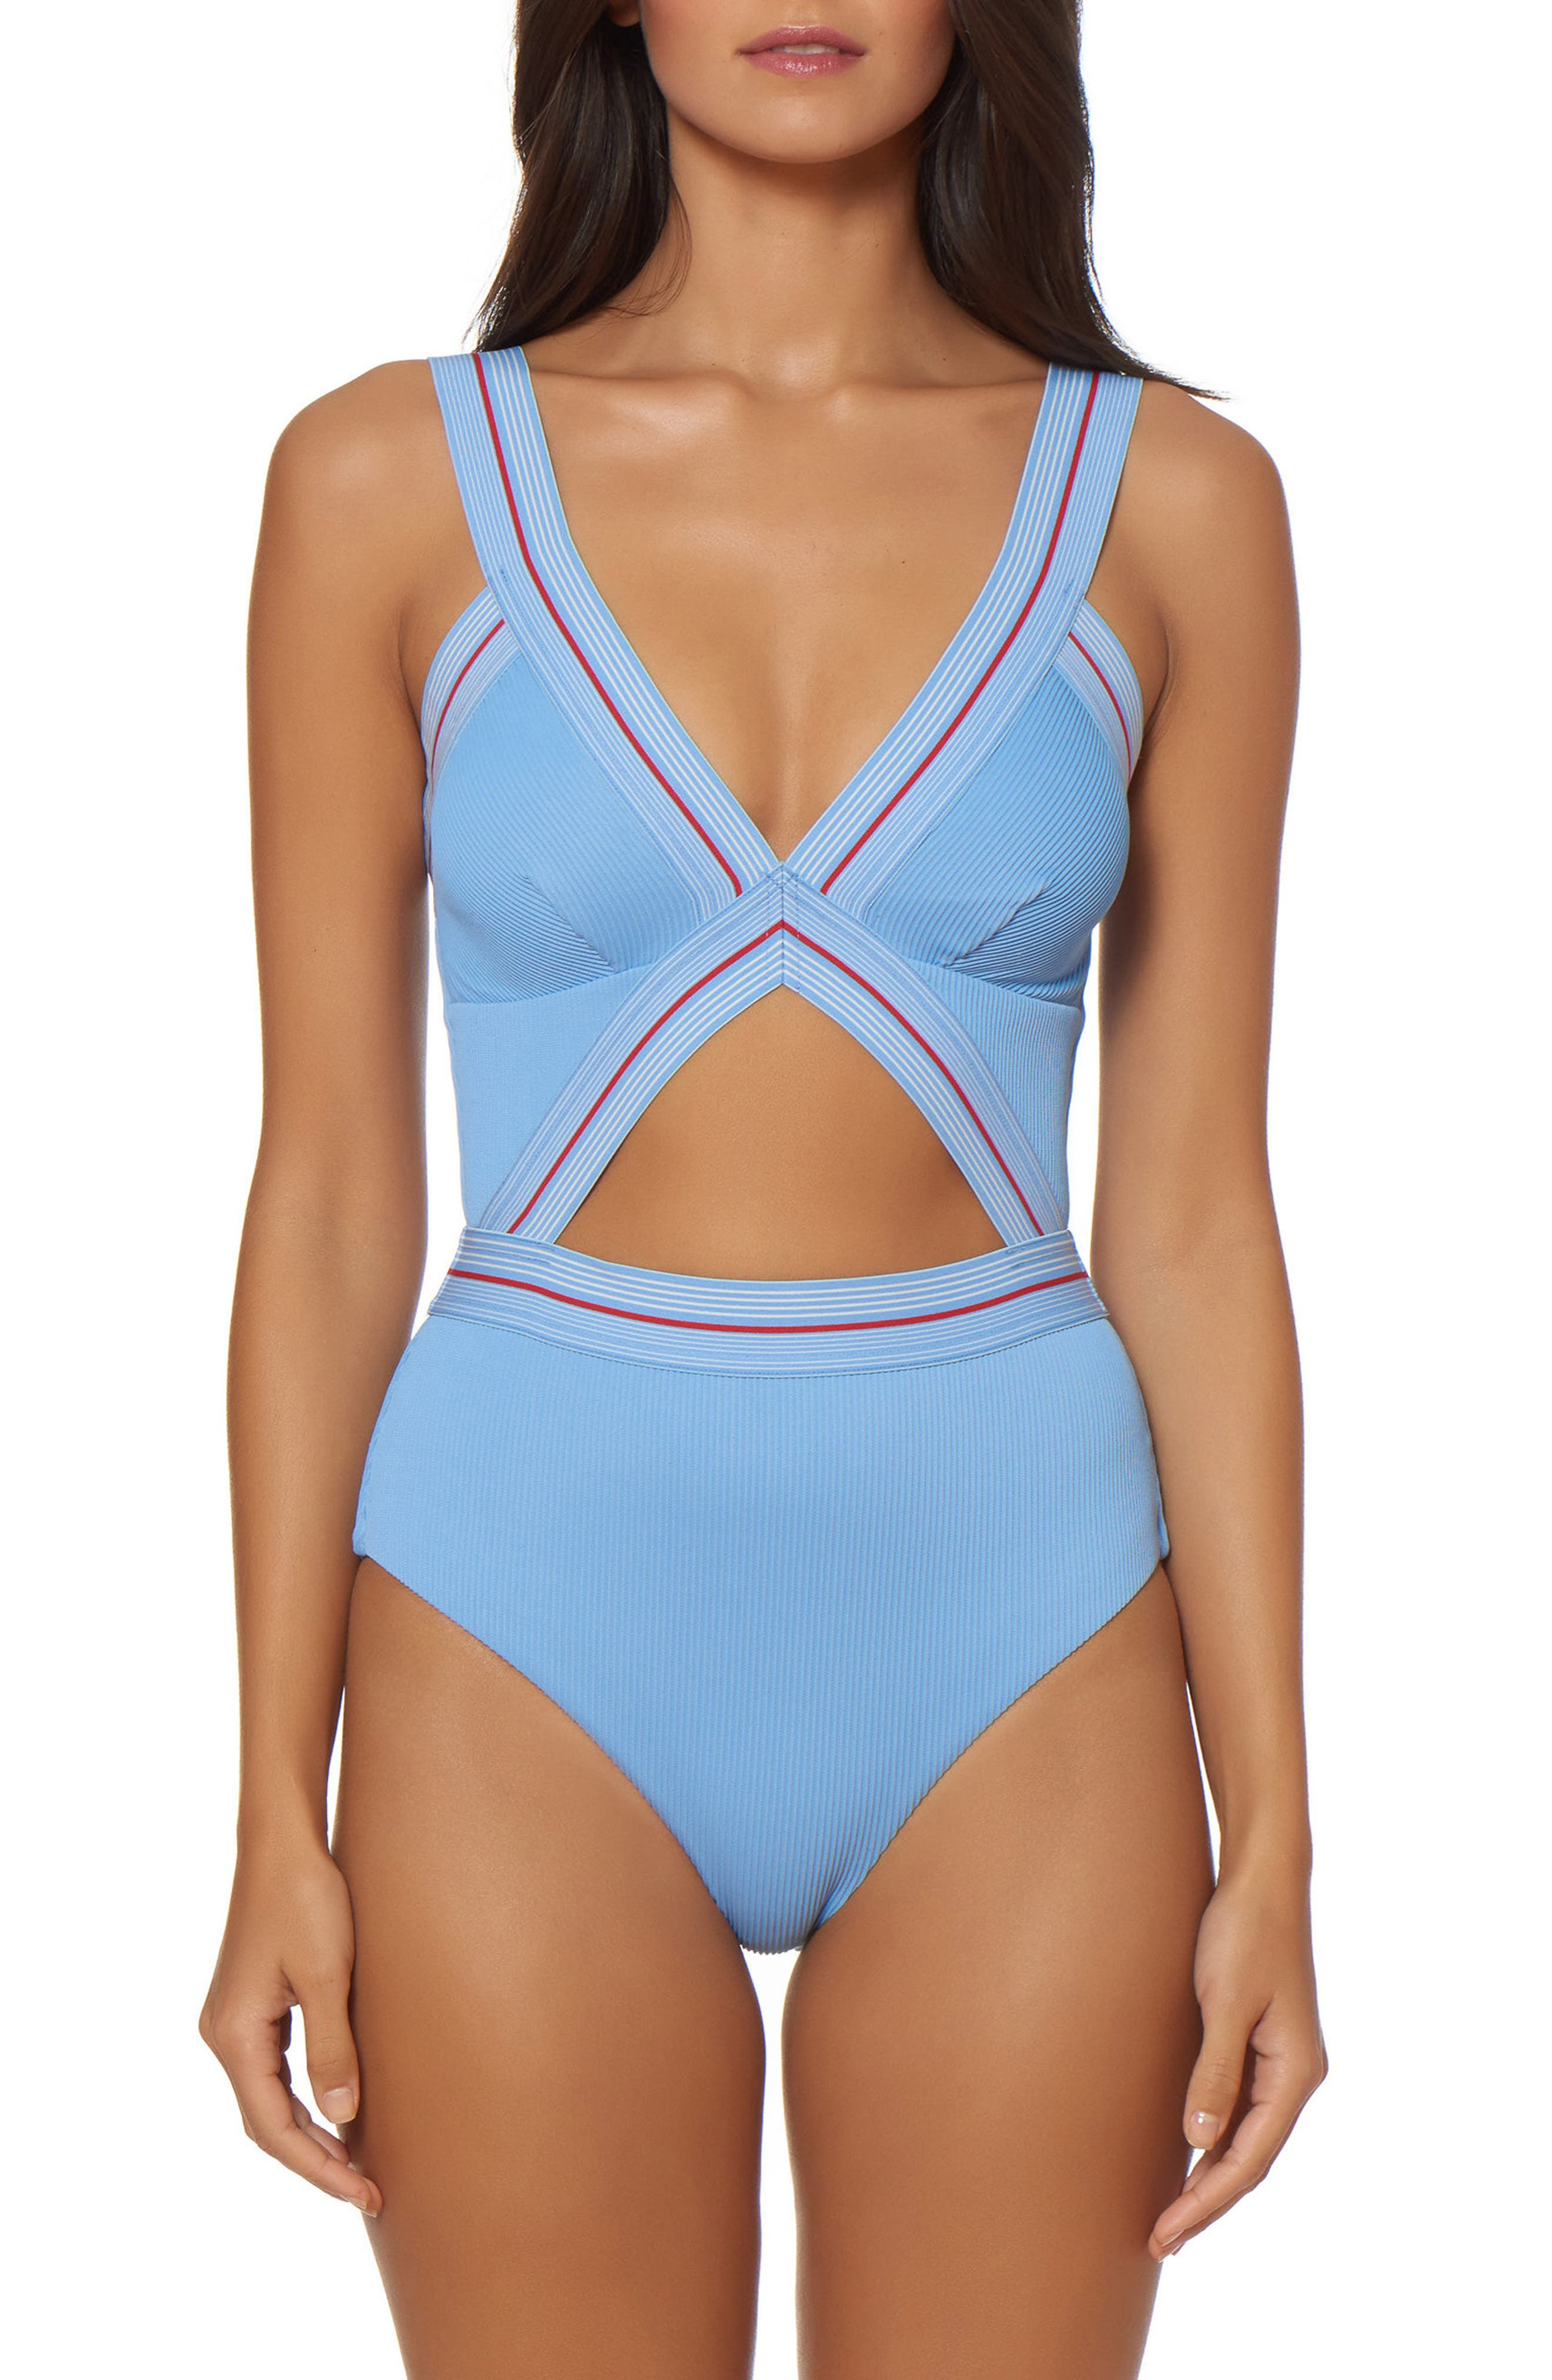 Bondi Beach One-Piece Swimsuit,                         Main,                         color, 452